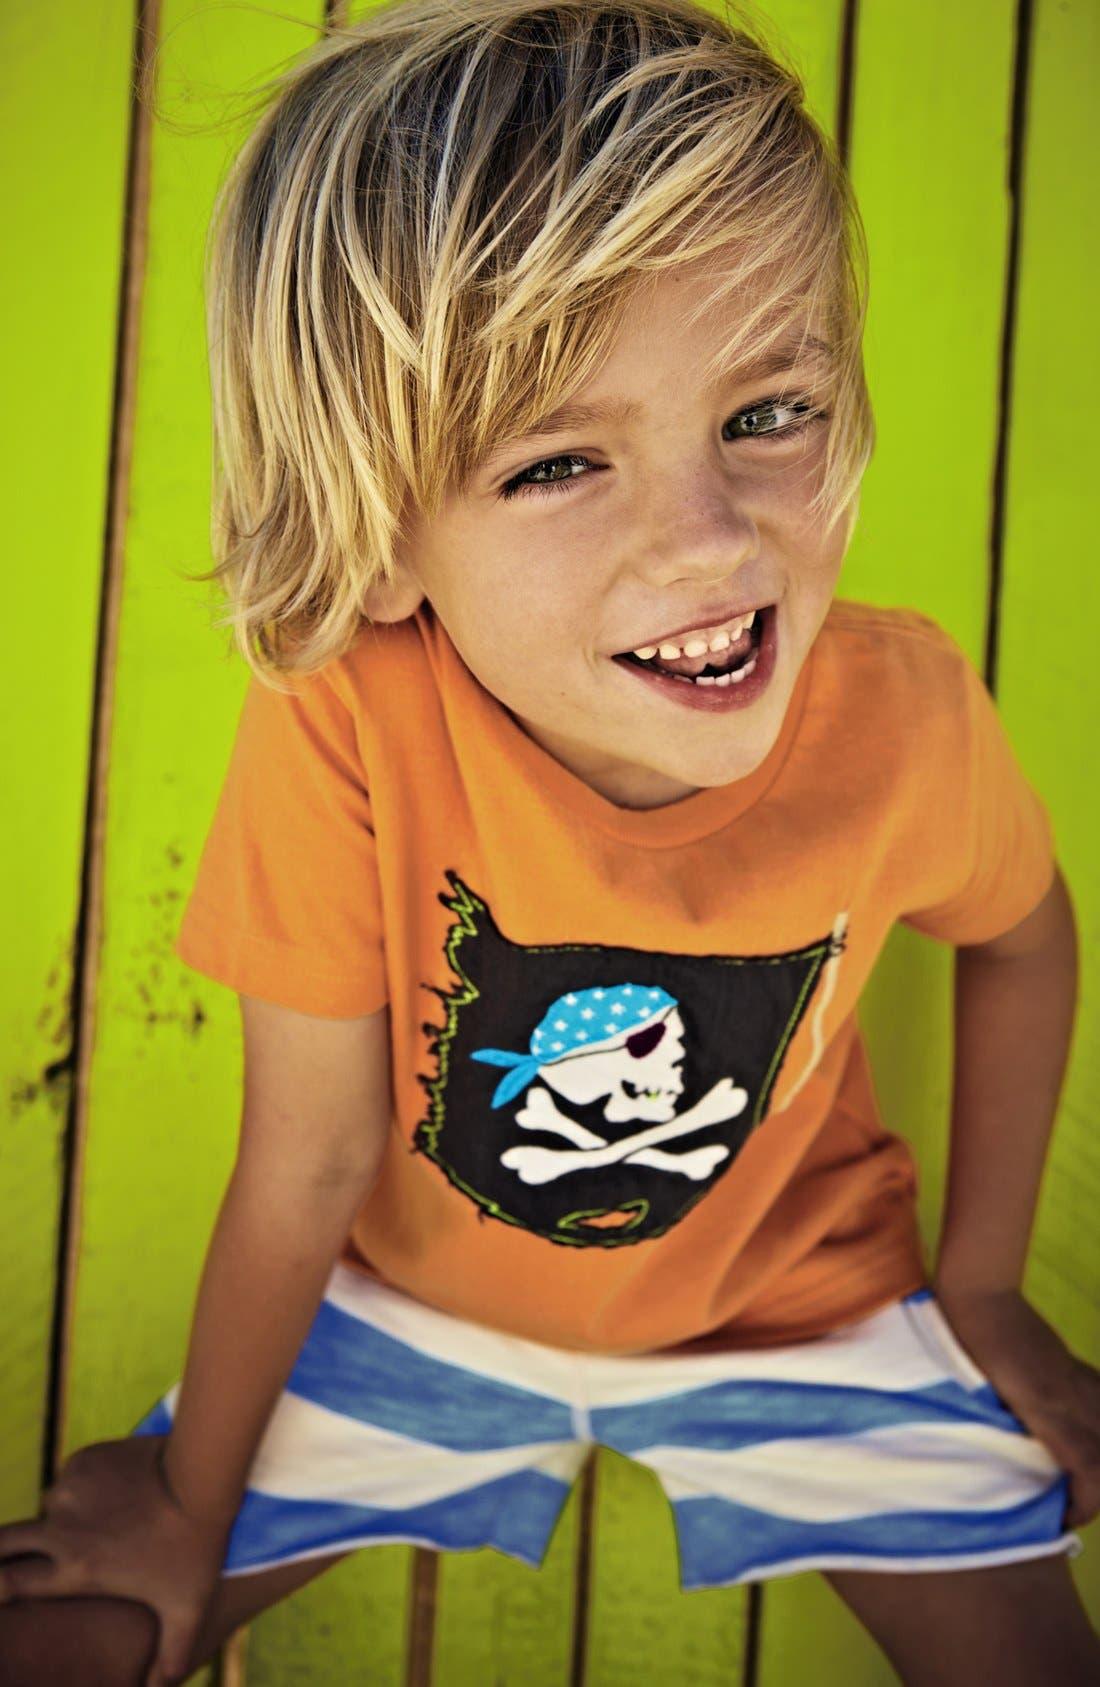 Alternate Image 2  - Mini Boden T-Shirt & Shorts (Toddler, Little Boys & Big Boys)